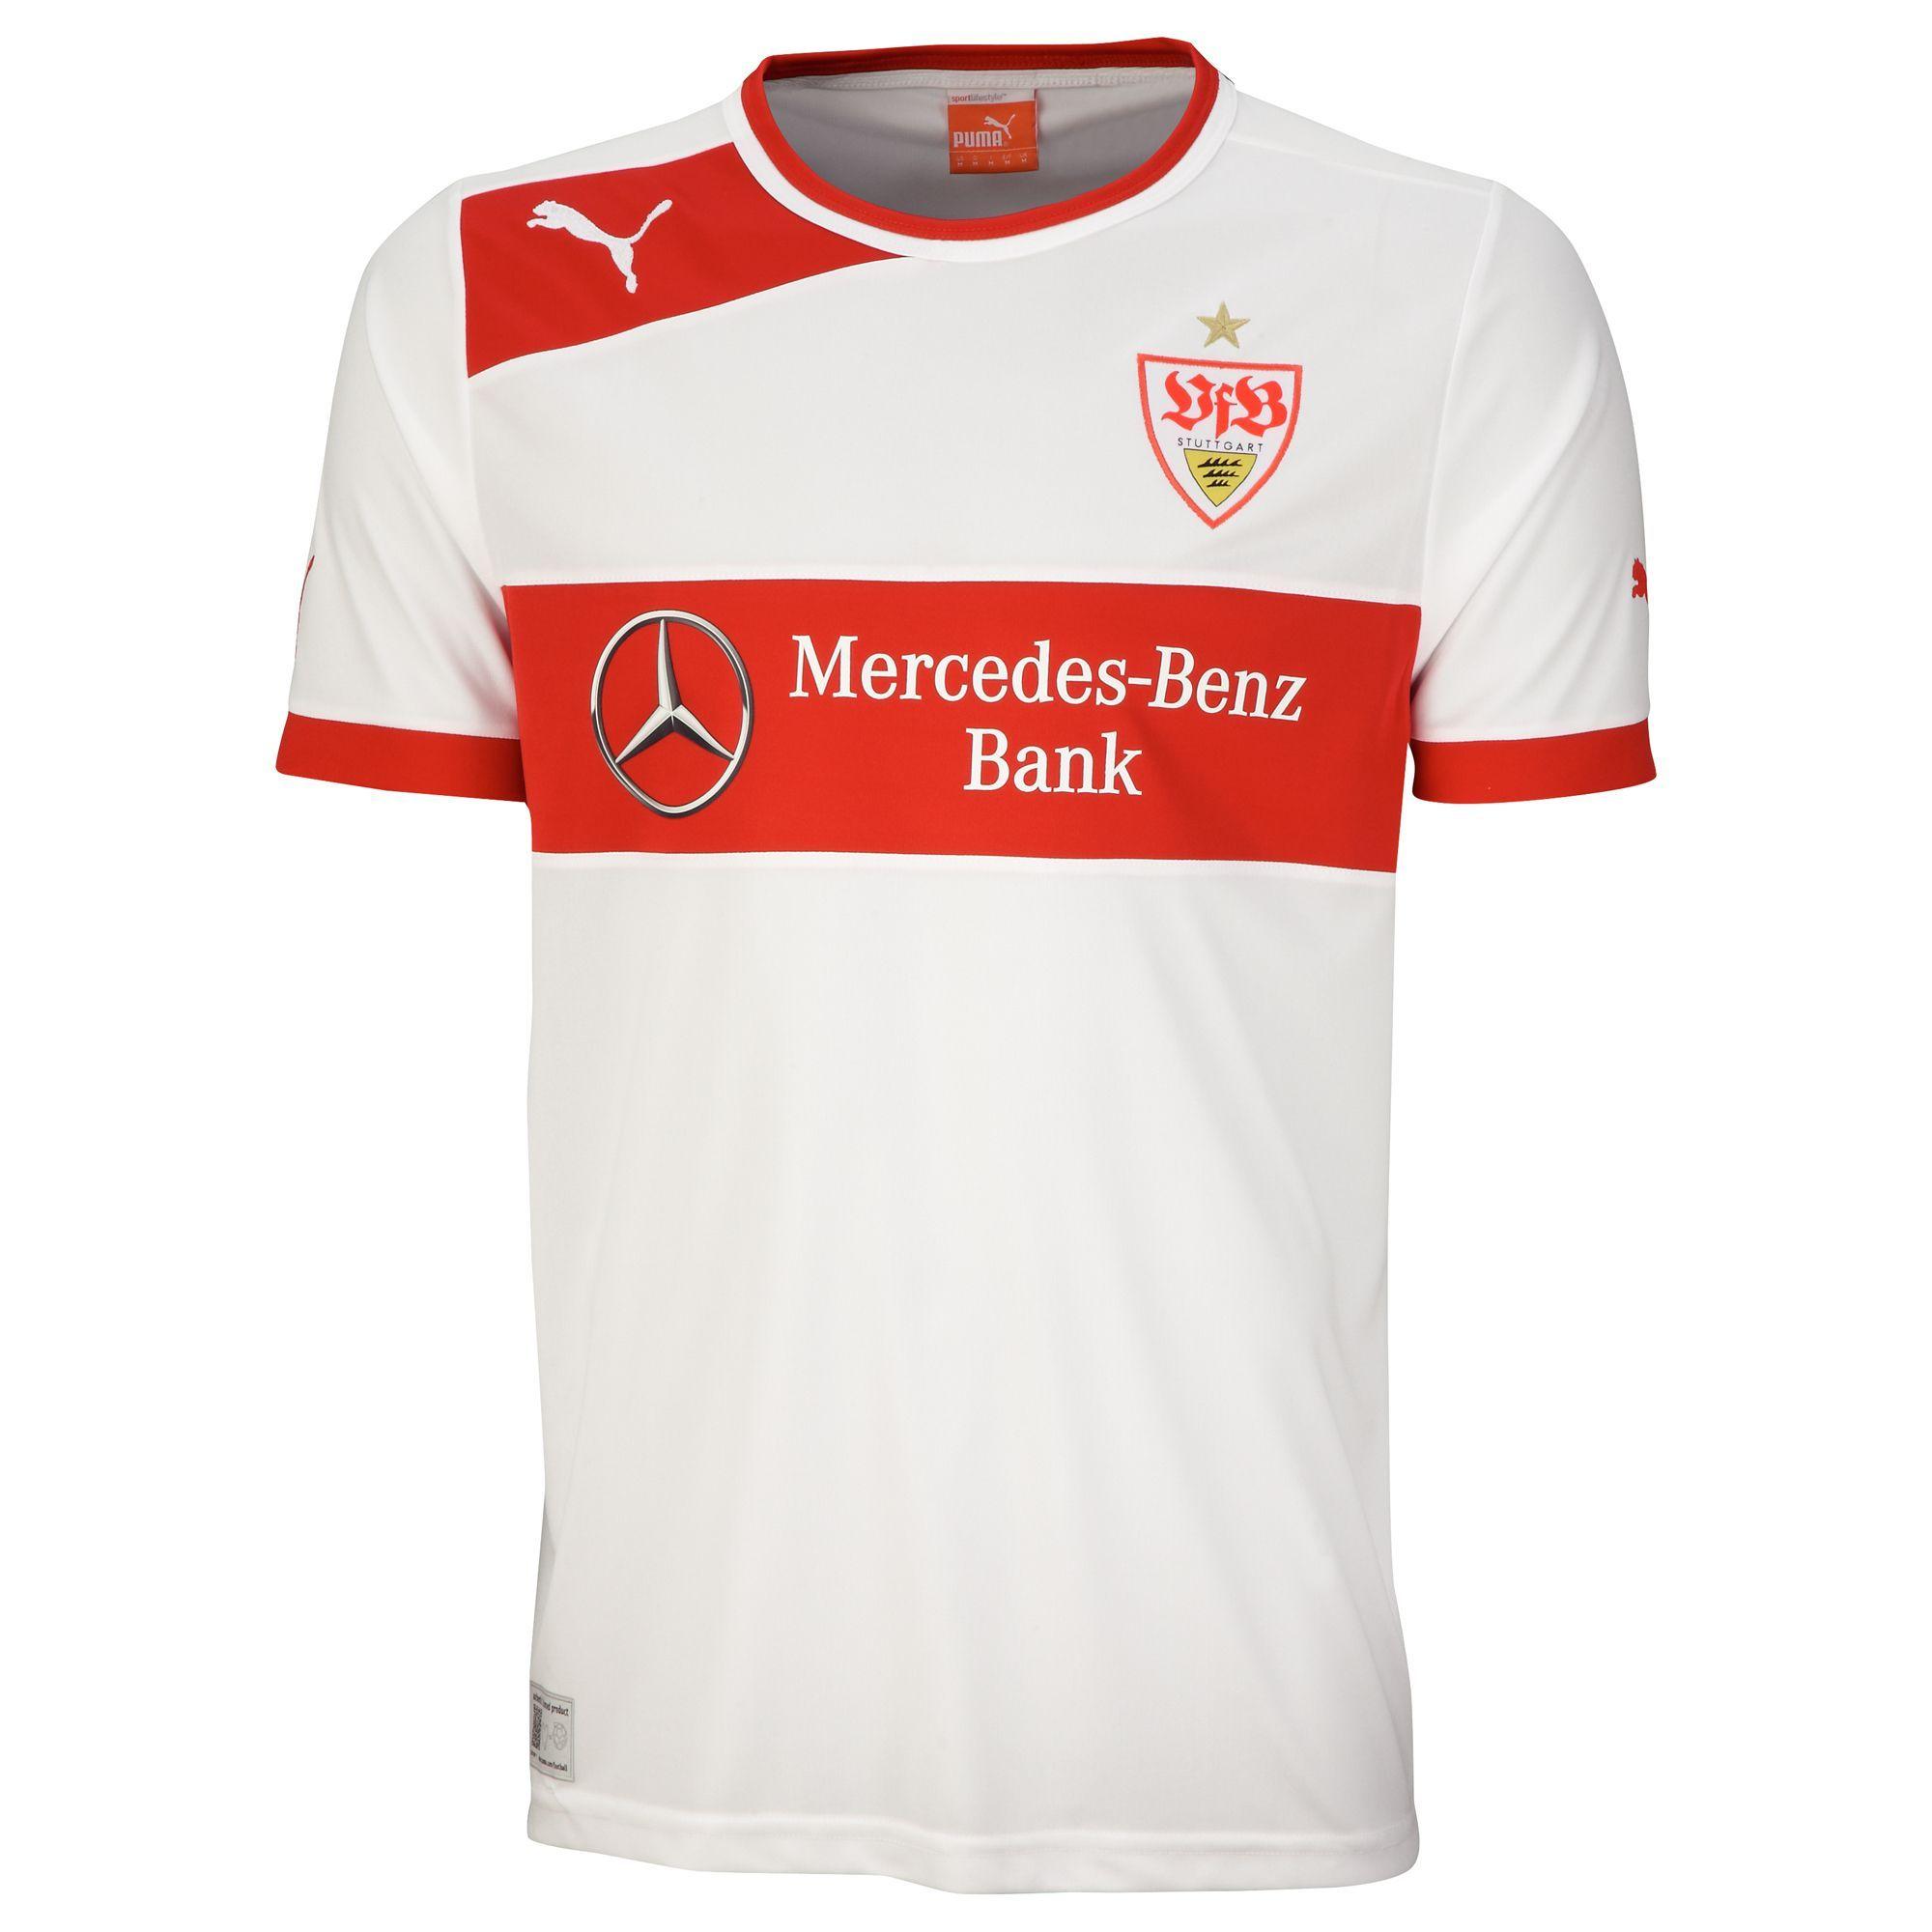 VfB Stuttgart (Germany) - 2012 2013 Puma Home Shirt Camisas De Futebol 9018fe36f2727